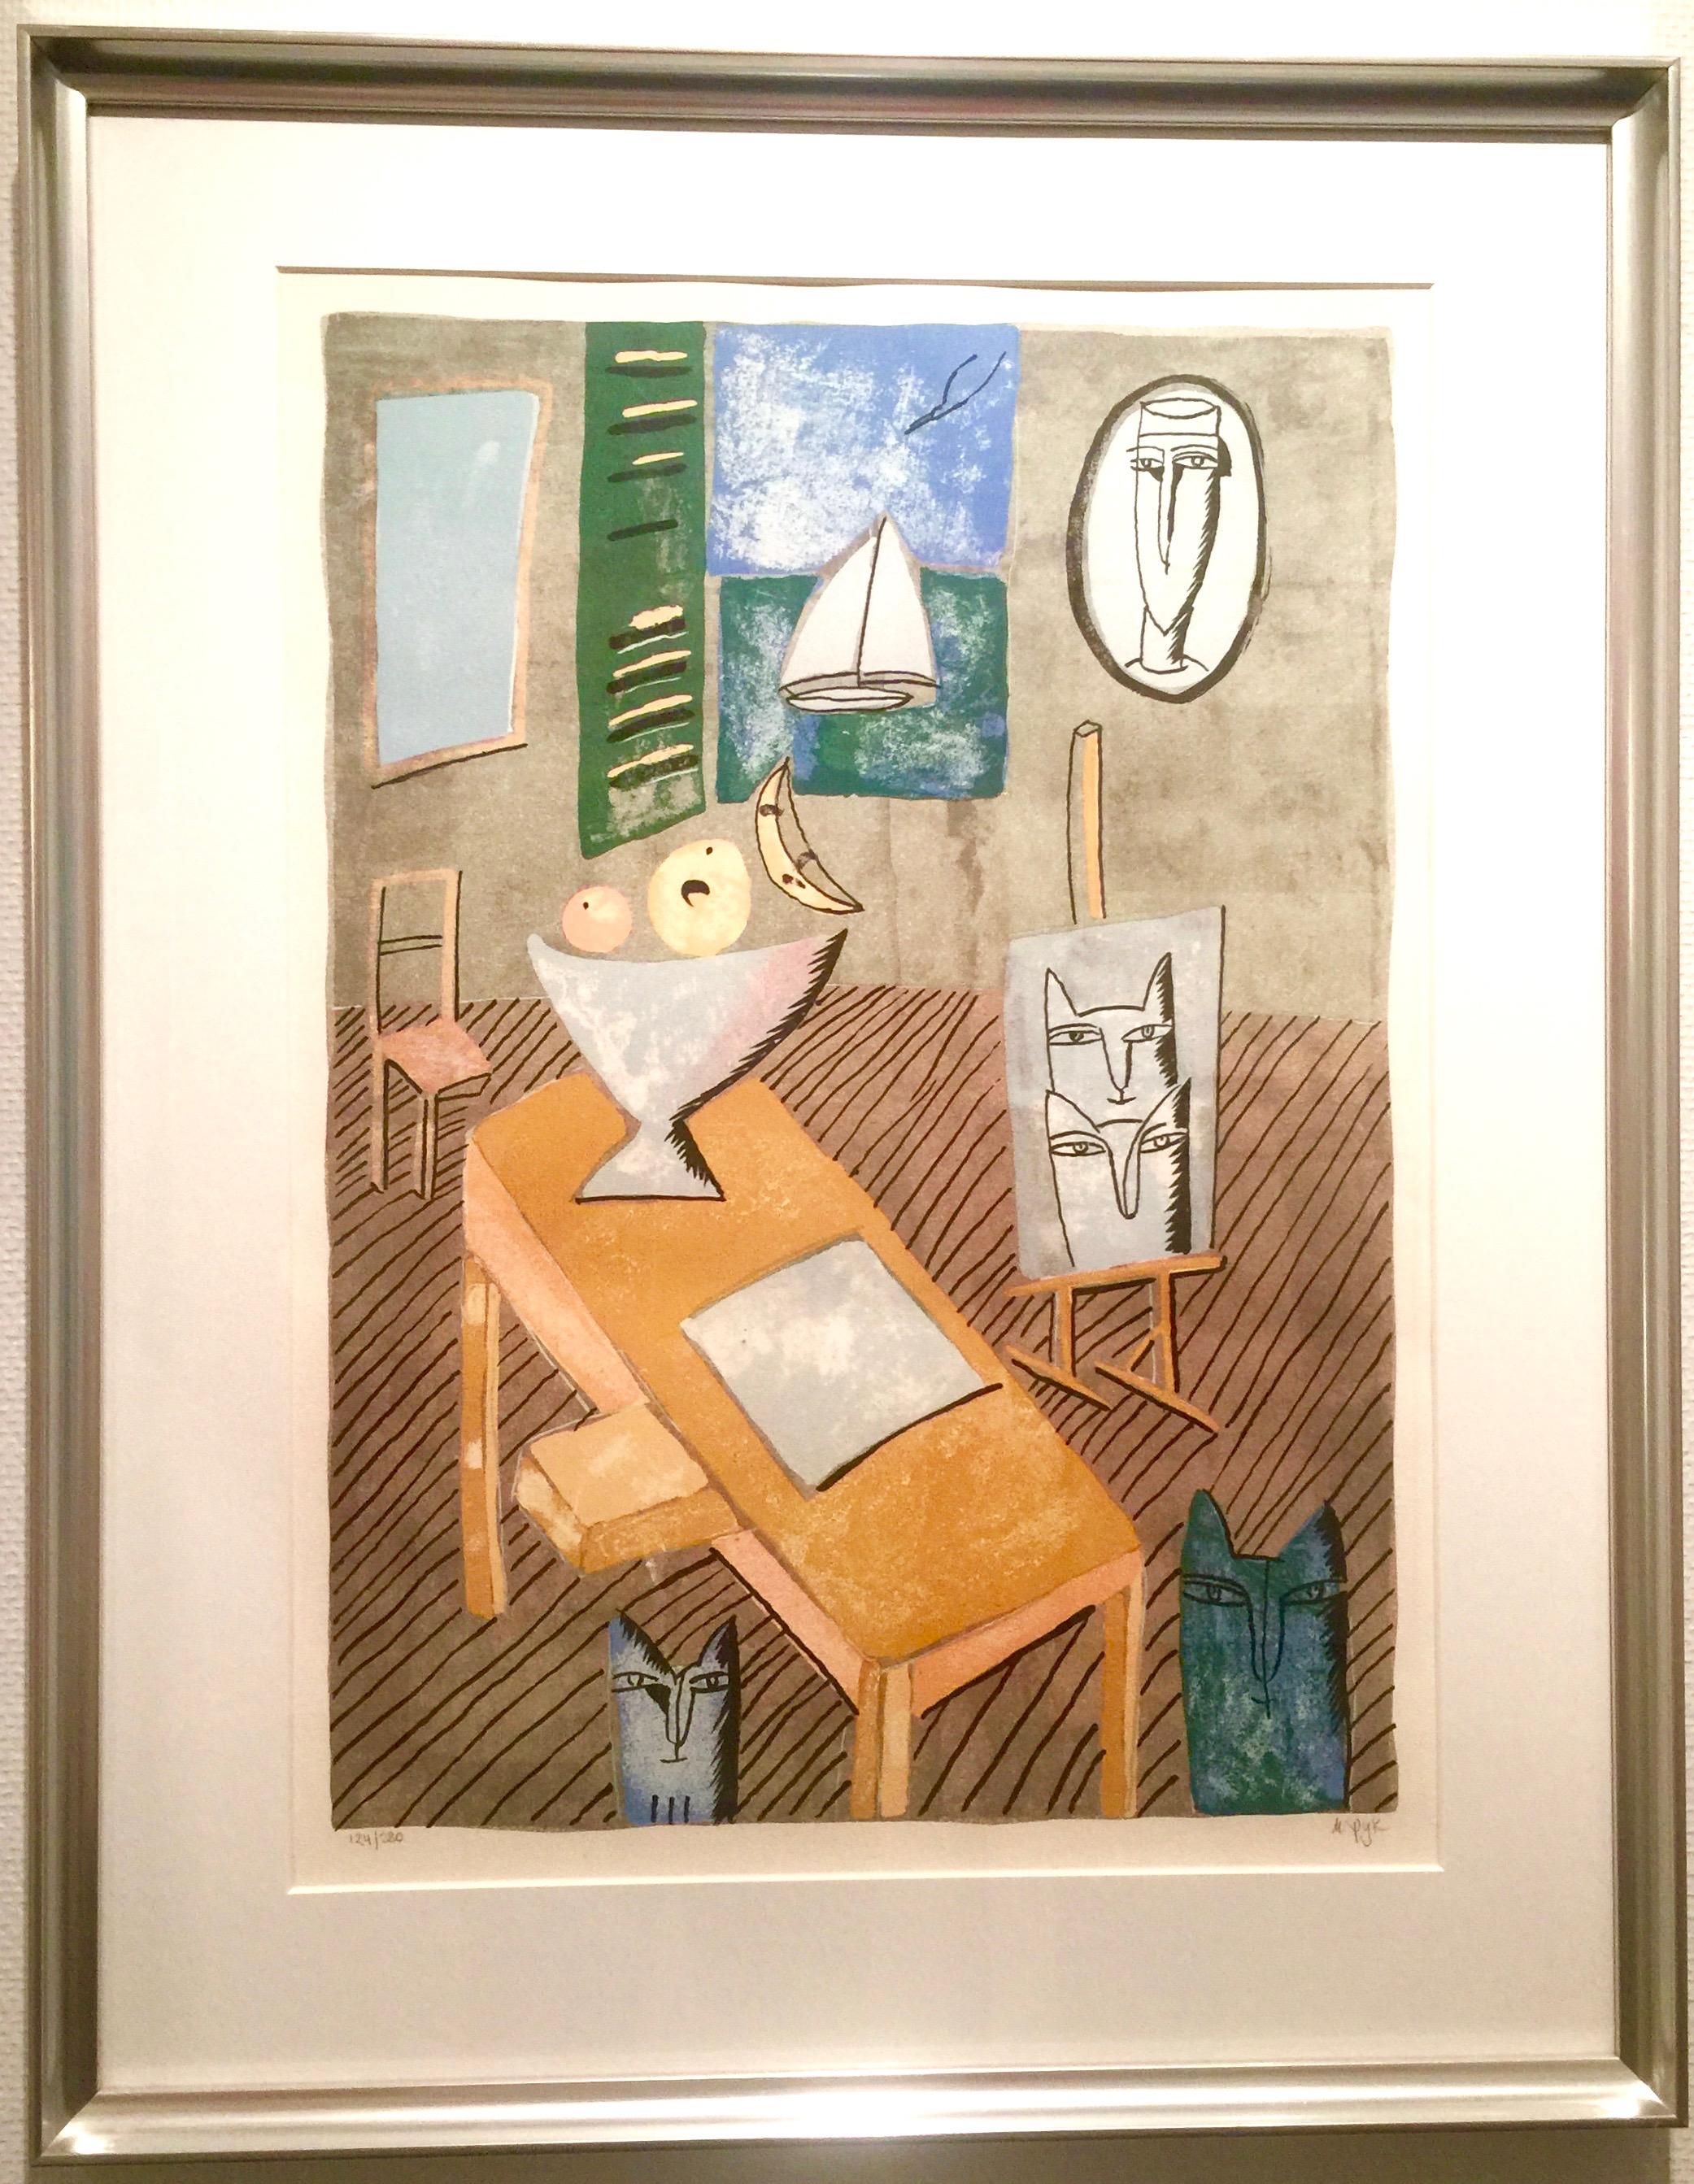 Madeleine Pyk - The fruit bowl, lithograph